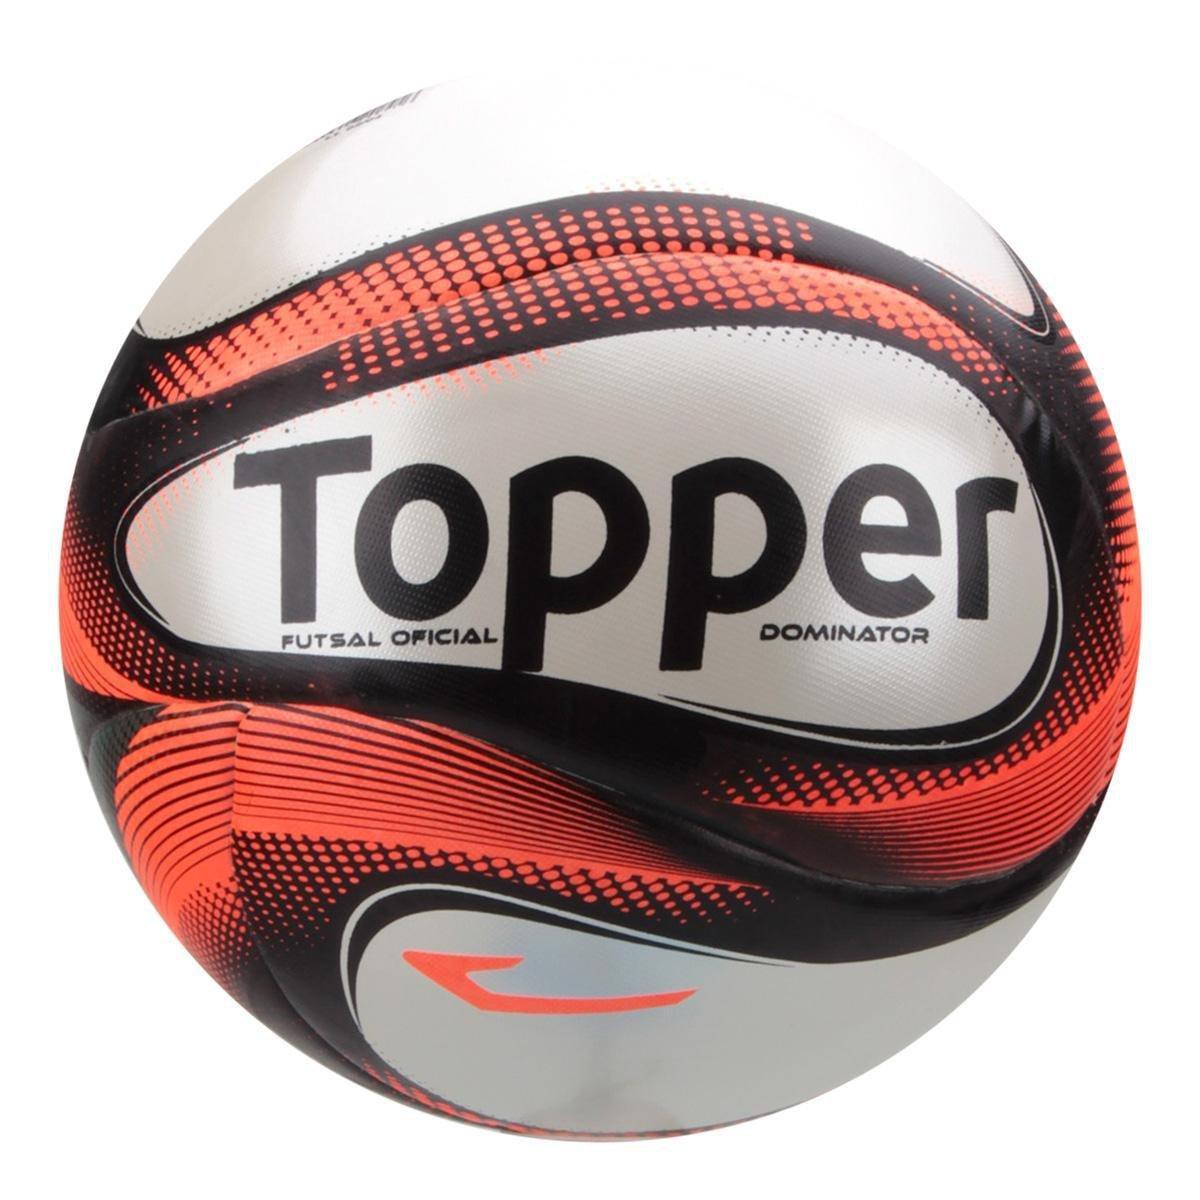 4581da8da5 Bola Futsal Topper Dominator Pro - Vermelho e Preto